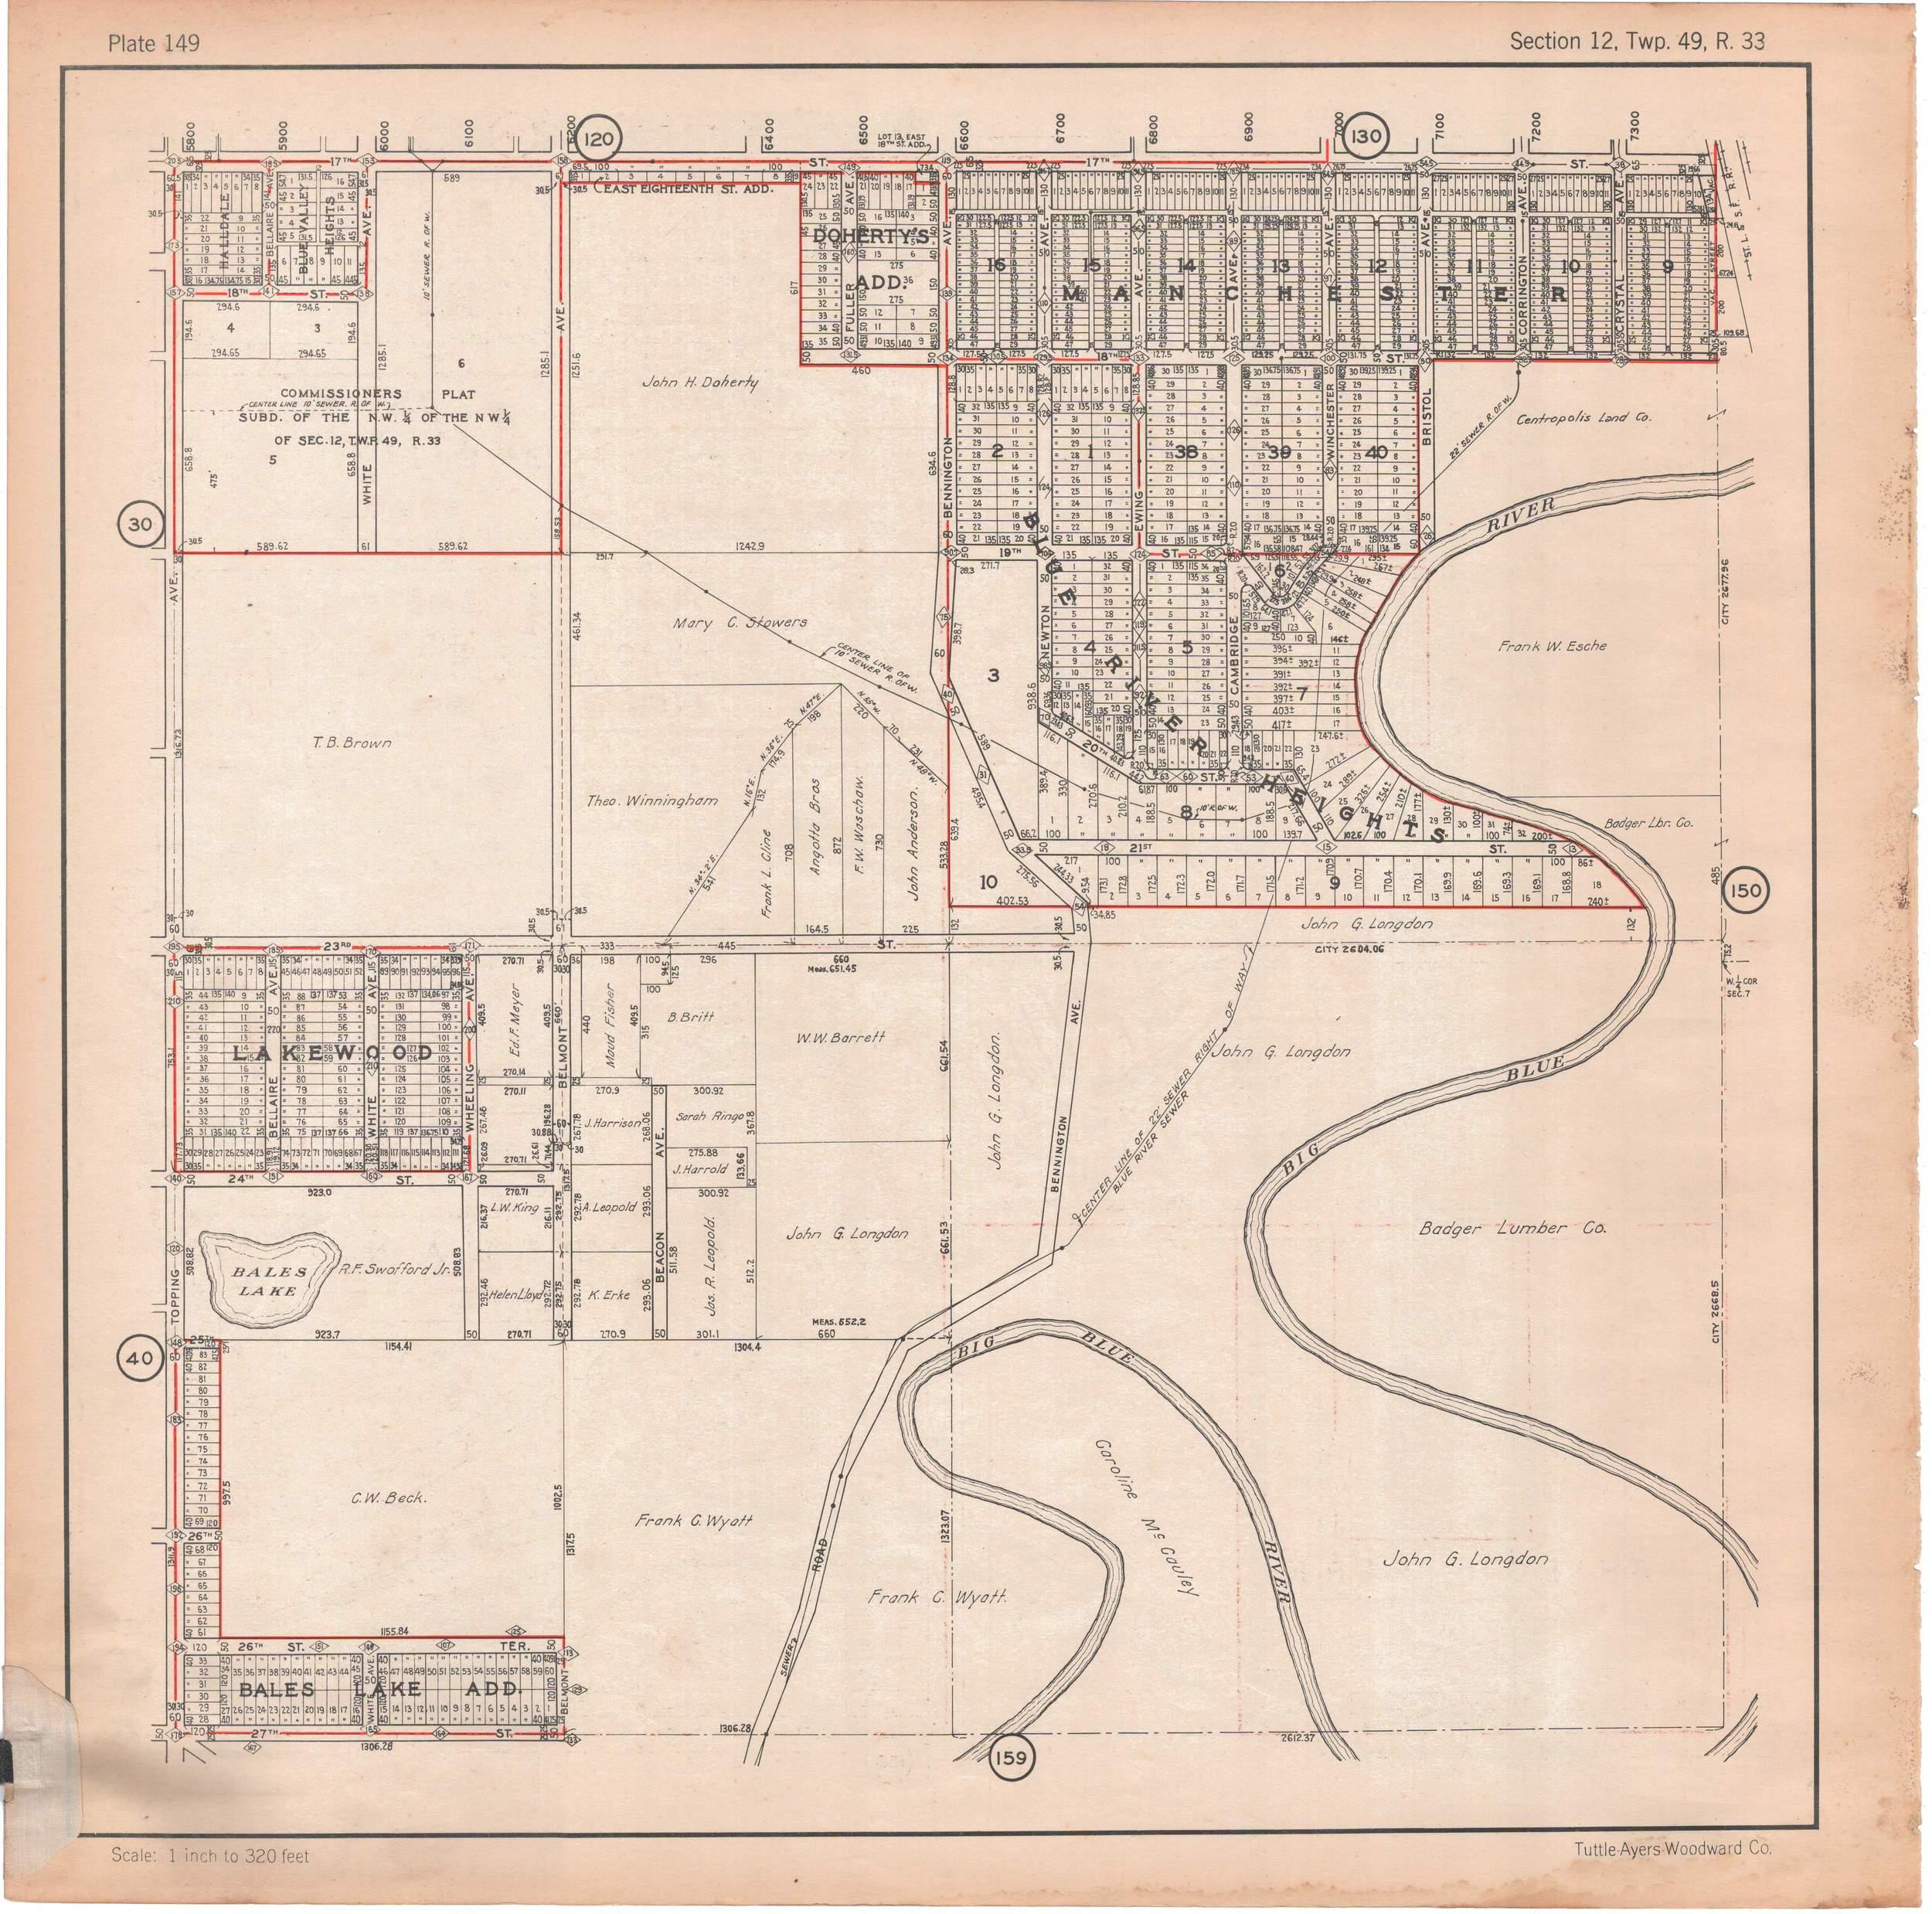 1925 TUTTLE_AYERS_Plate_149.JPG